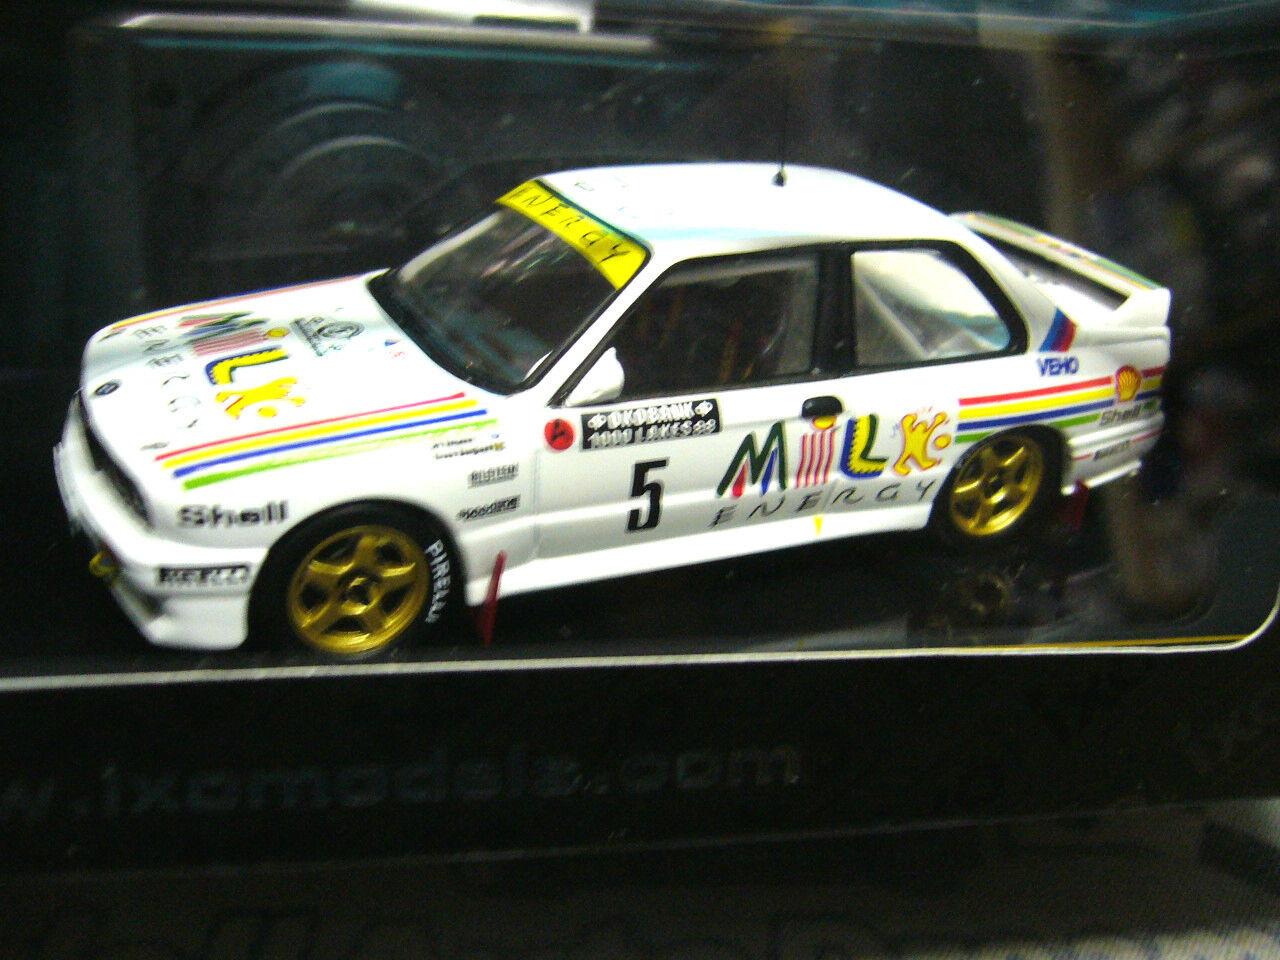 BMW m3 e30 rallye vatanen taille a wm Finland 1000 Lakes 1988  5 New nouveau IXO 1 43